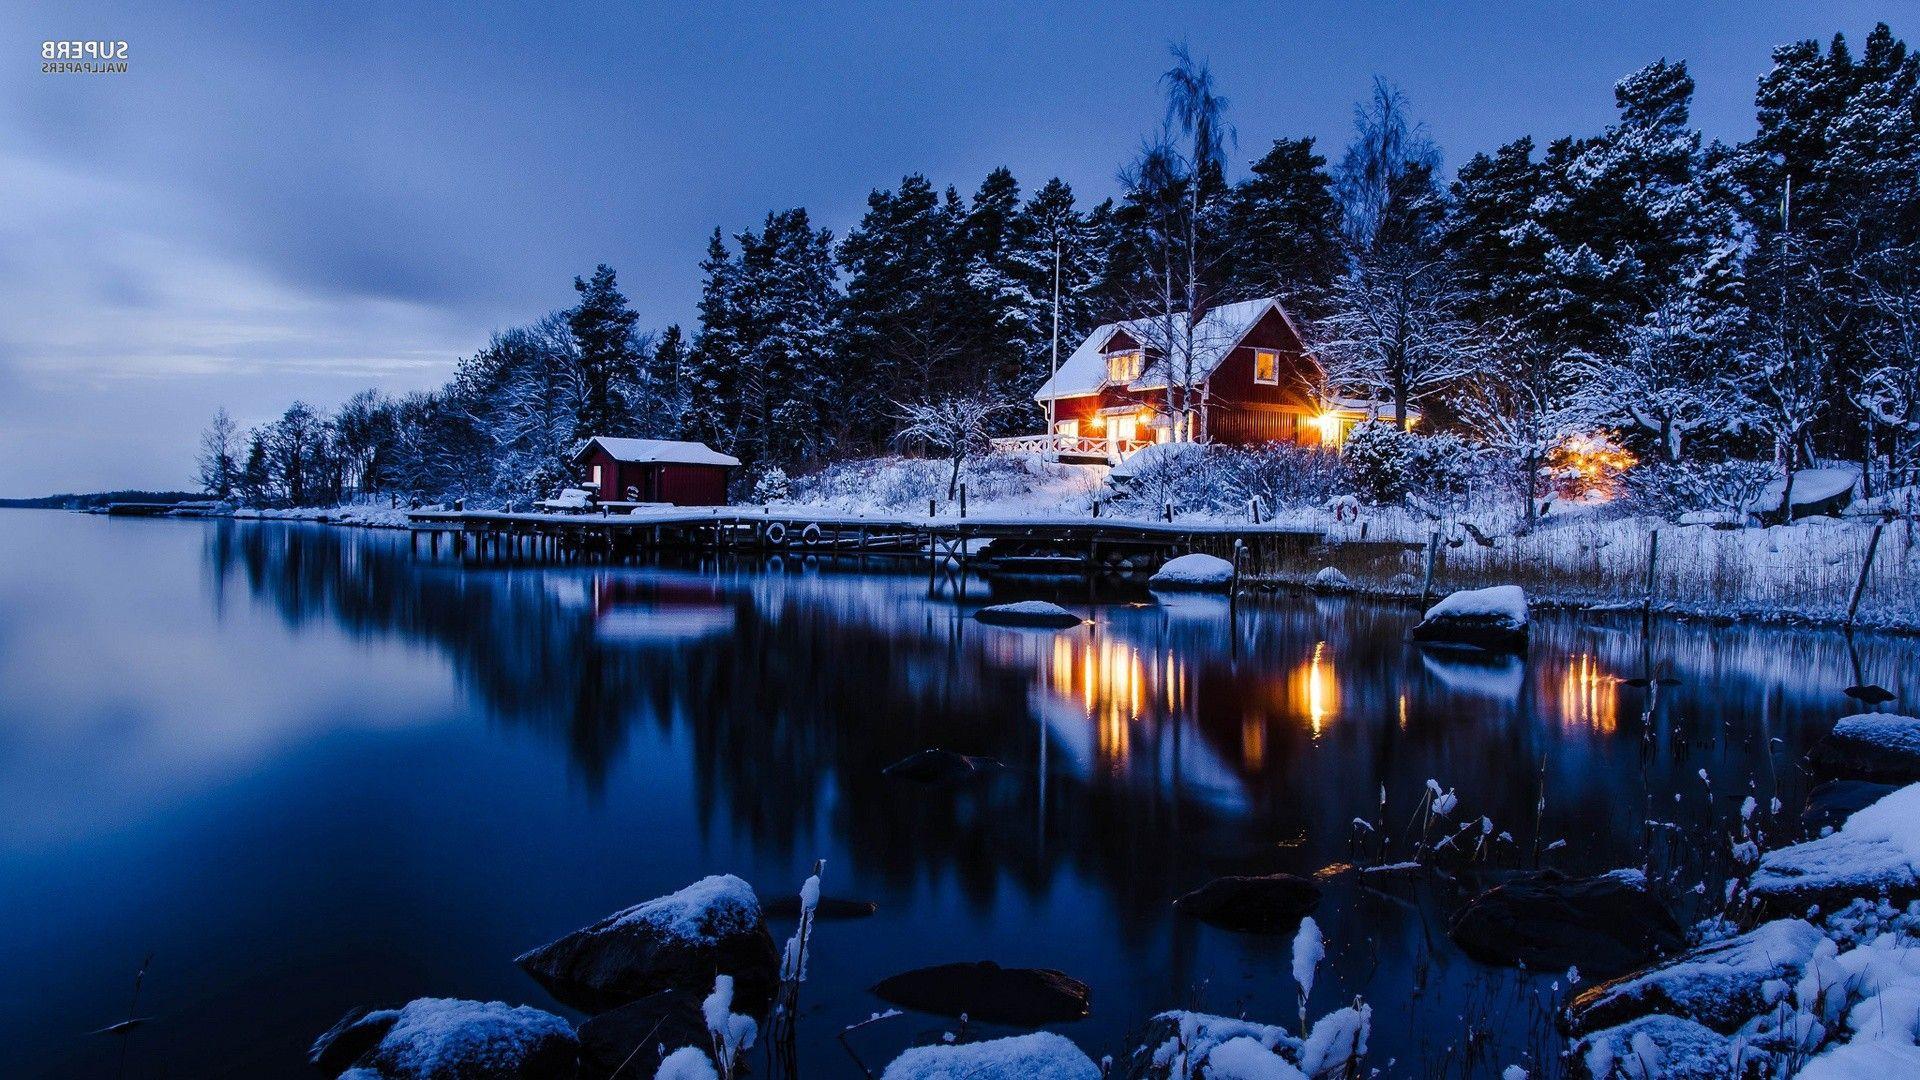 Free Winter image